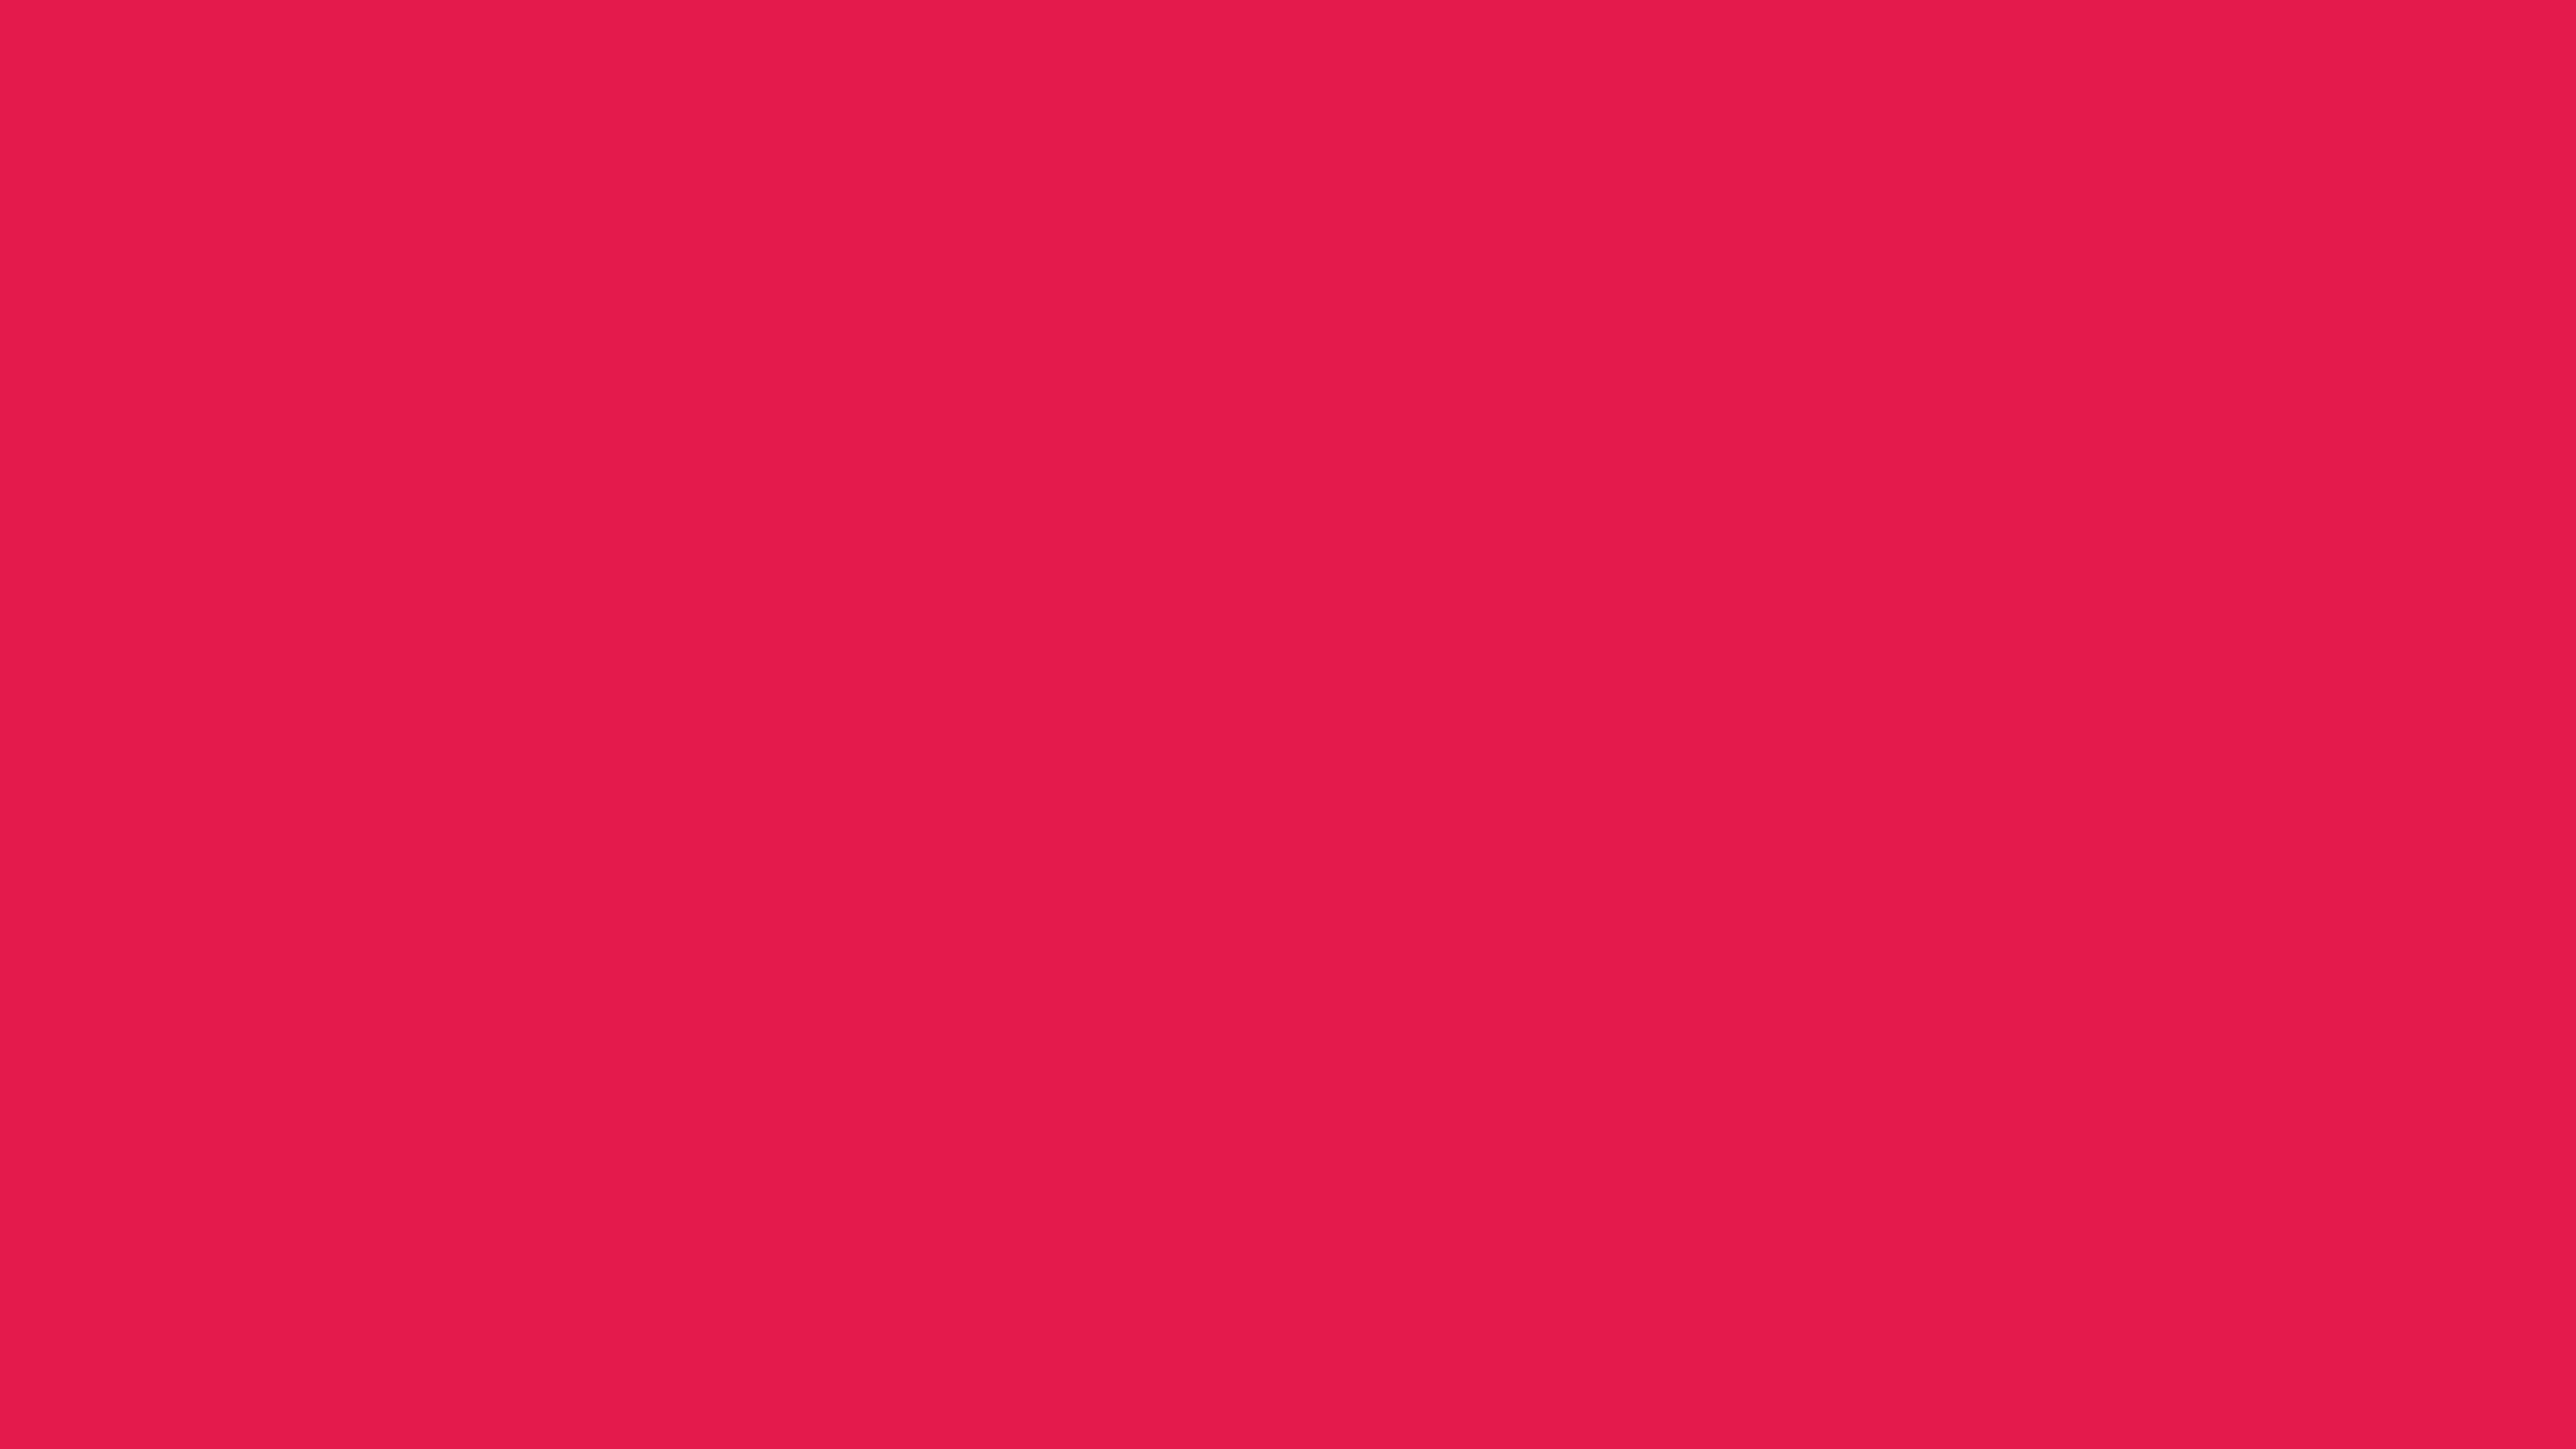 5120x2880 Spanish Crimson Solid Color Background